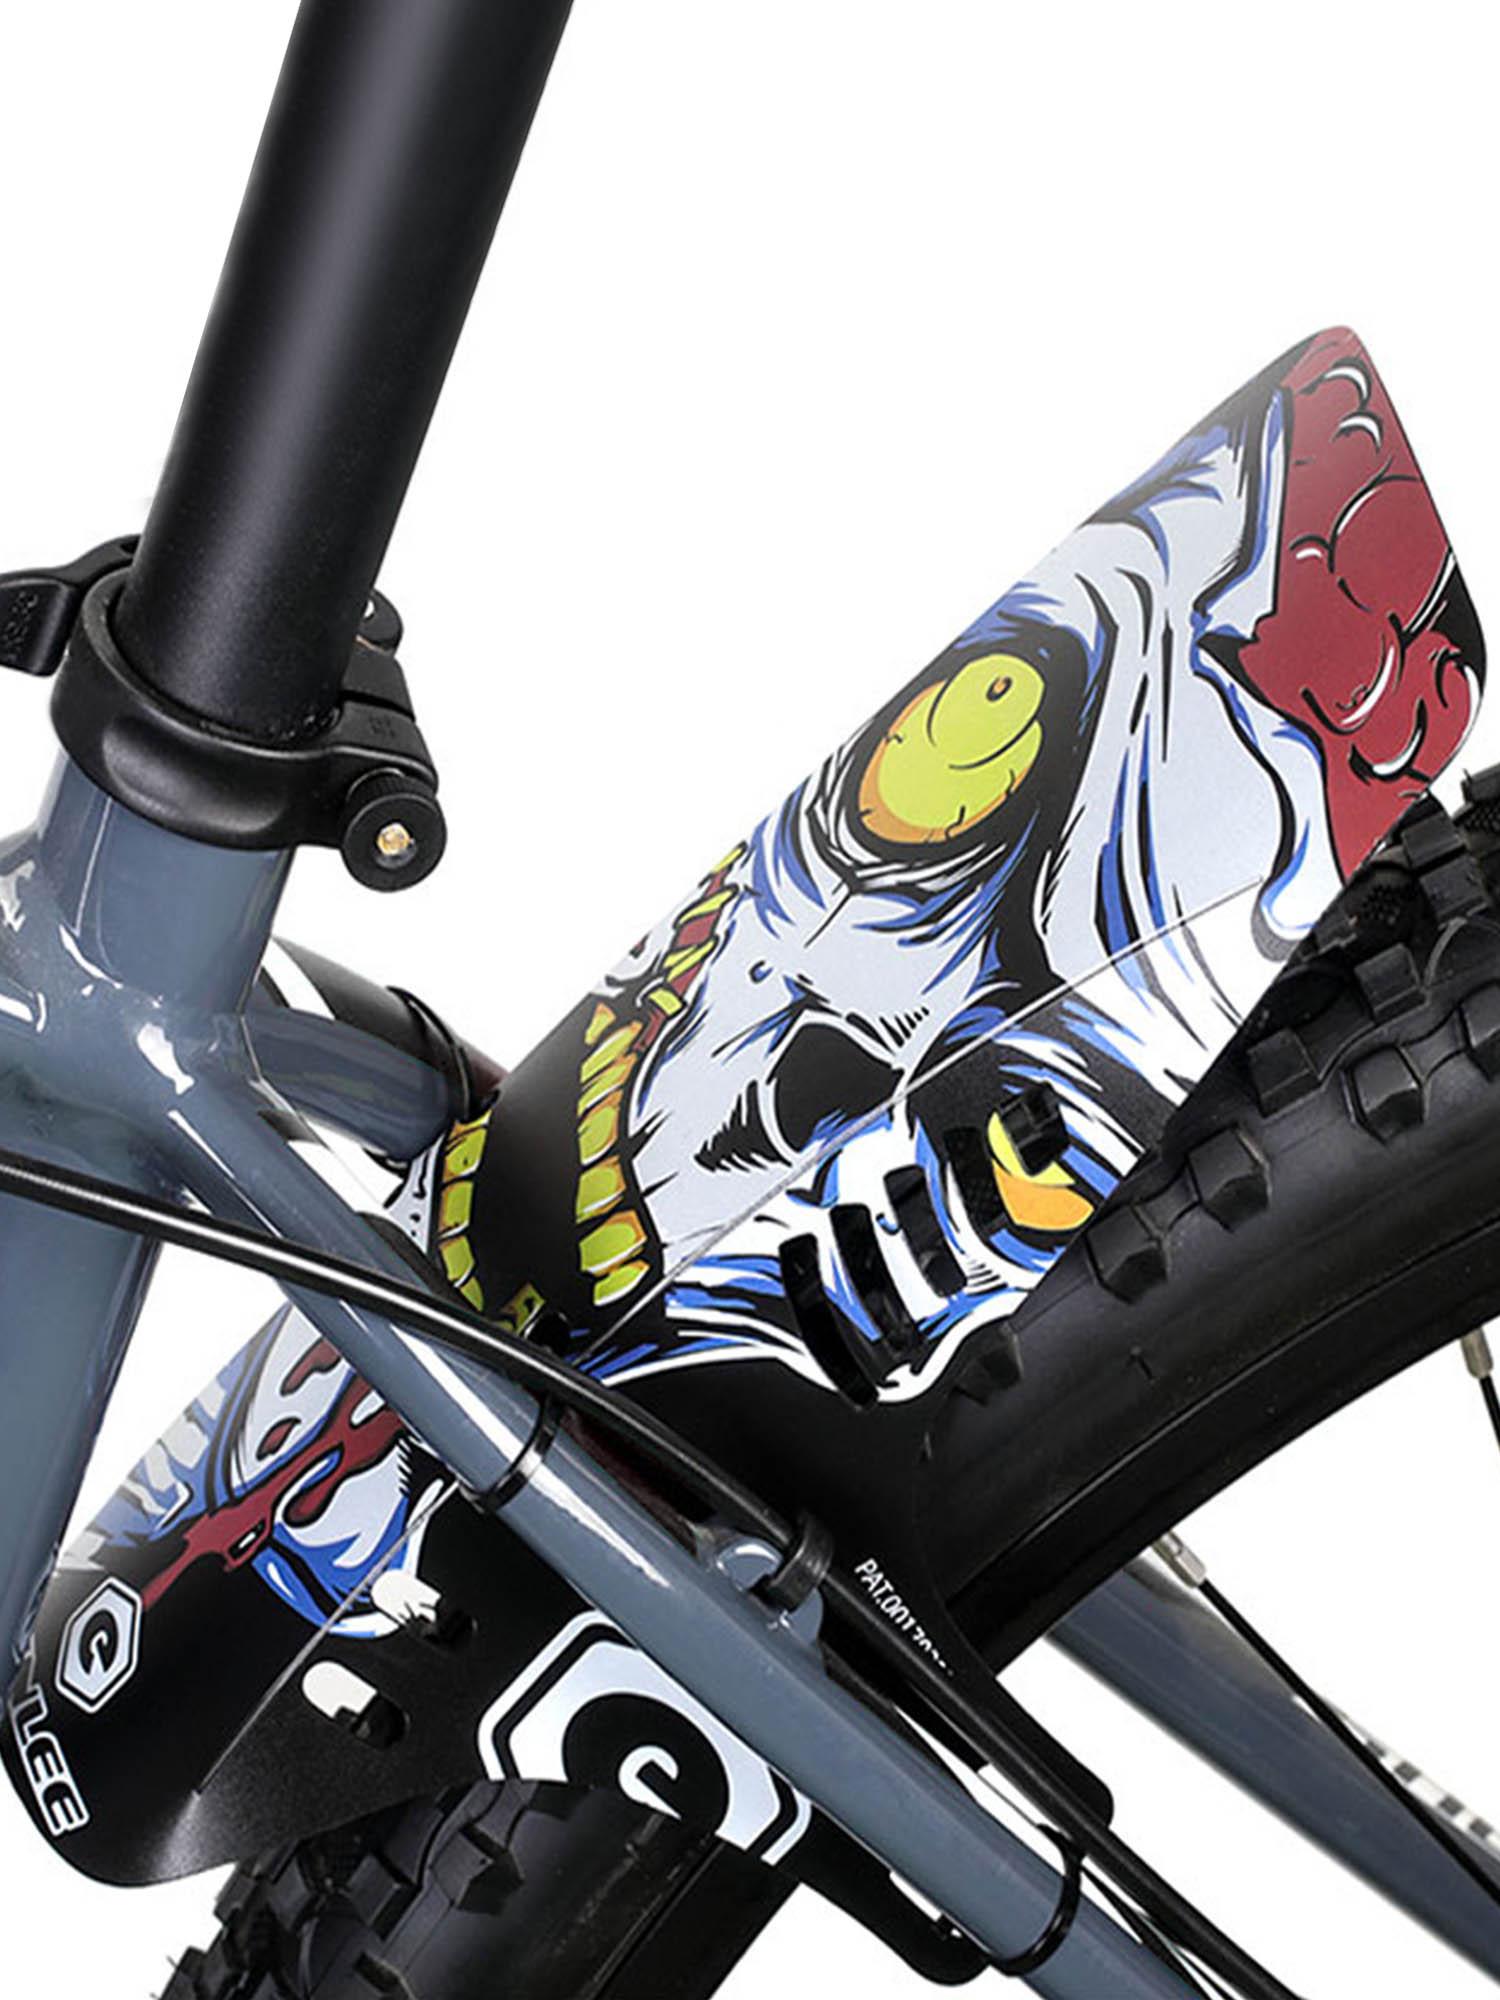 MTB Bicycle Fender Mountain Road Bike Front Rear Plastic Mudguard Rainplate Bike Wings Mud Guard Bicycle Accessories for Bicycle